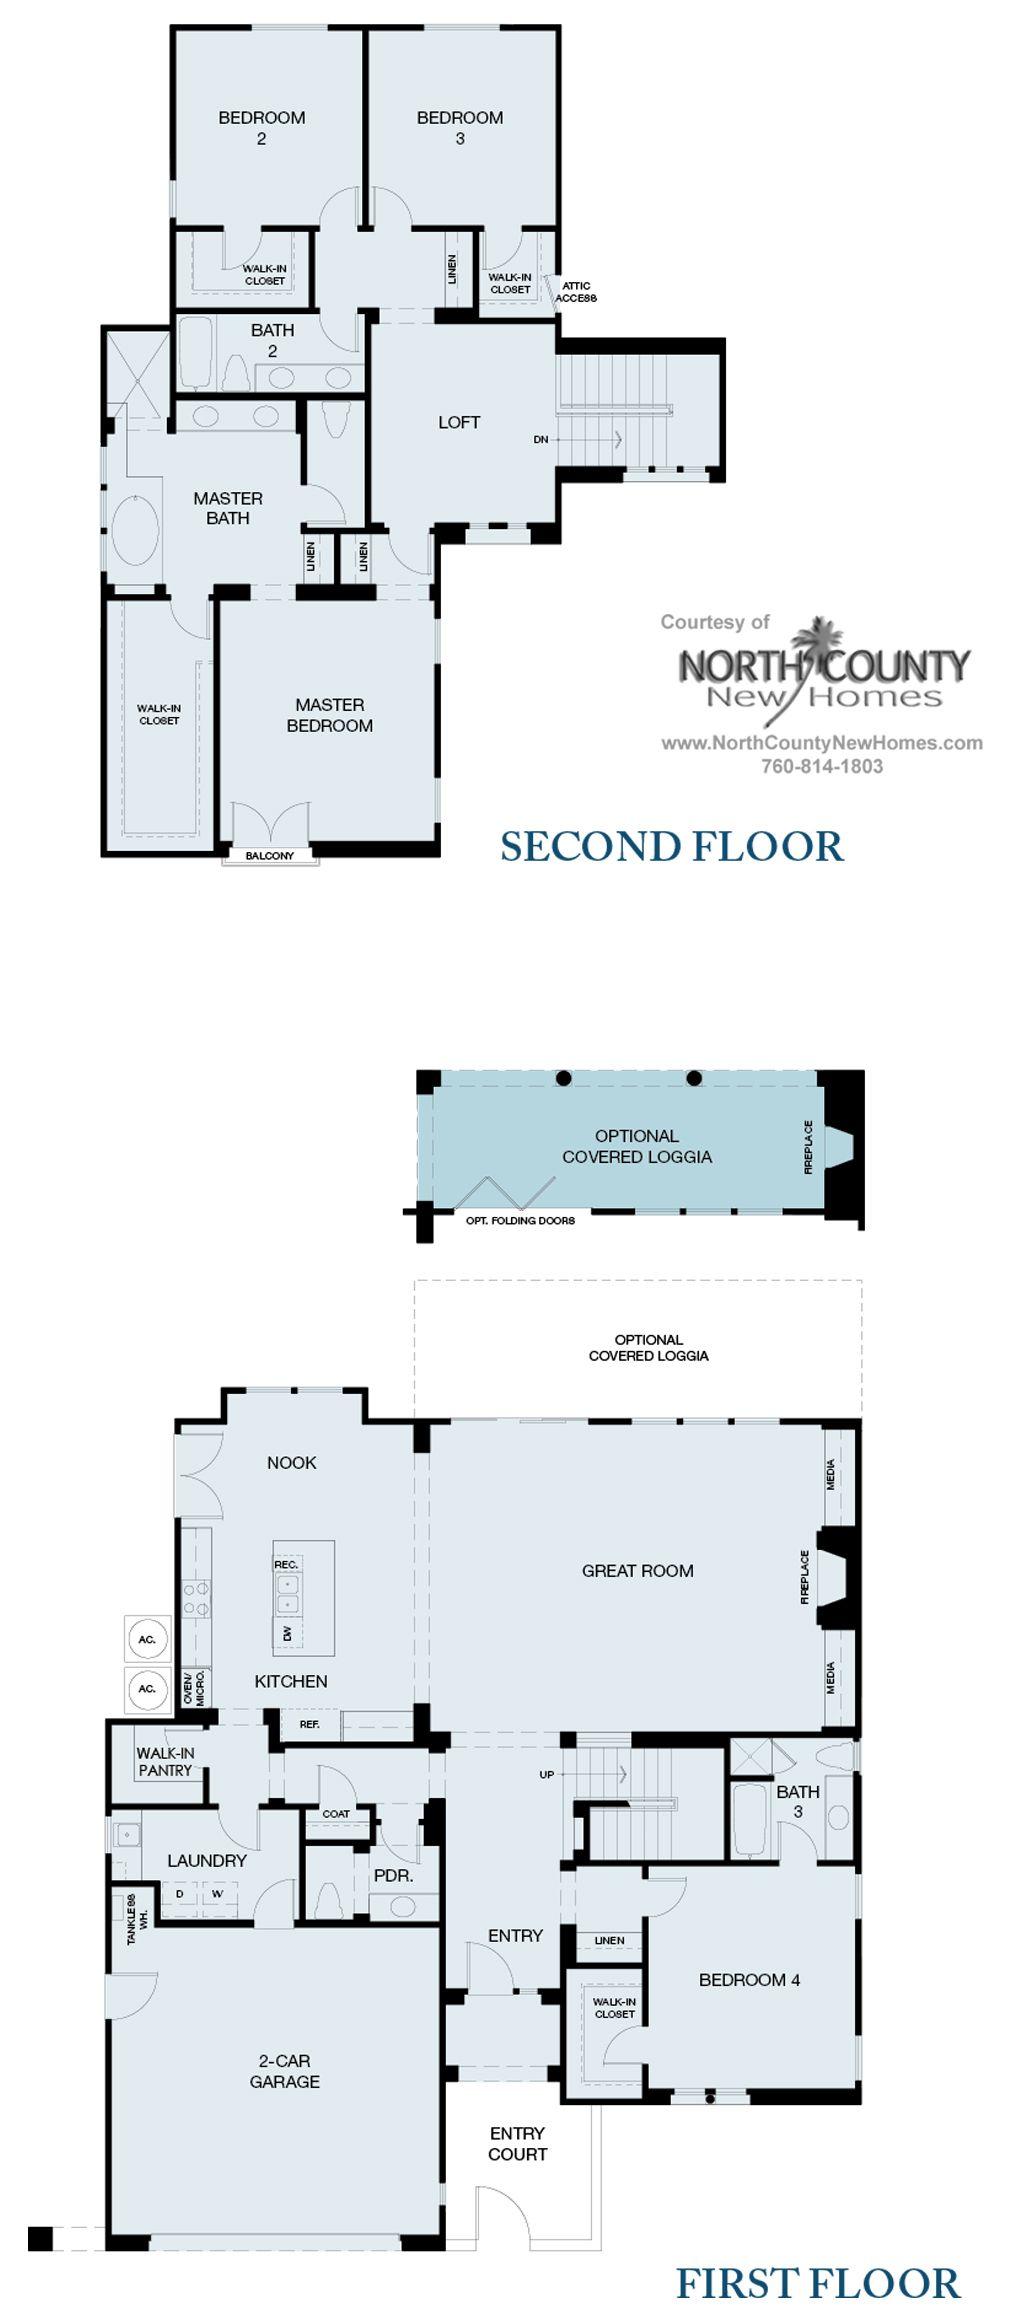 200d5e63fff485a5b9fcb032c5272e50 Top Result 50 Beautiful Luxury townhouse Floor Plans Image 2017 Zat3